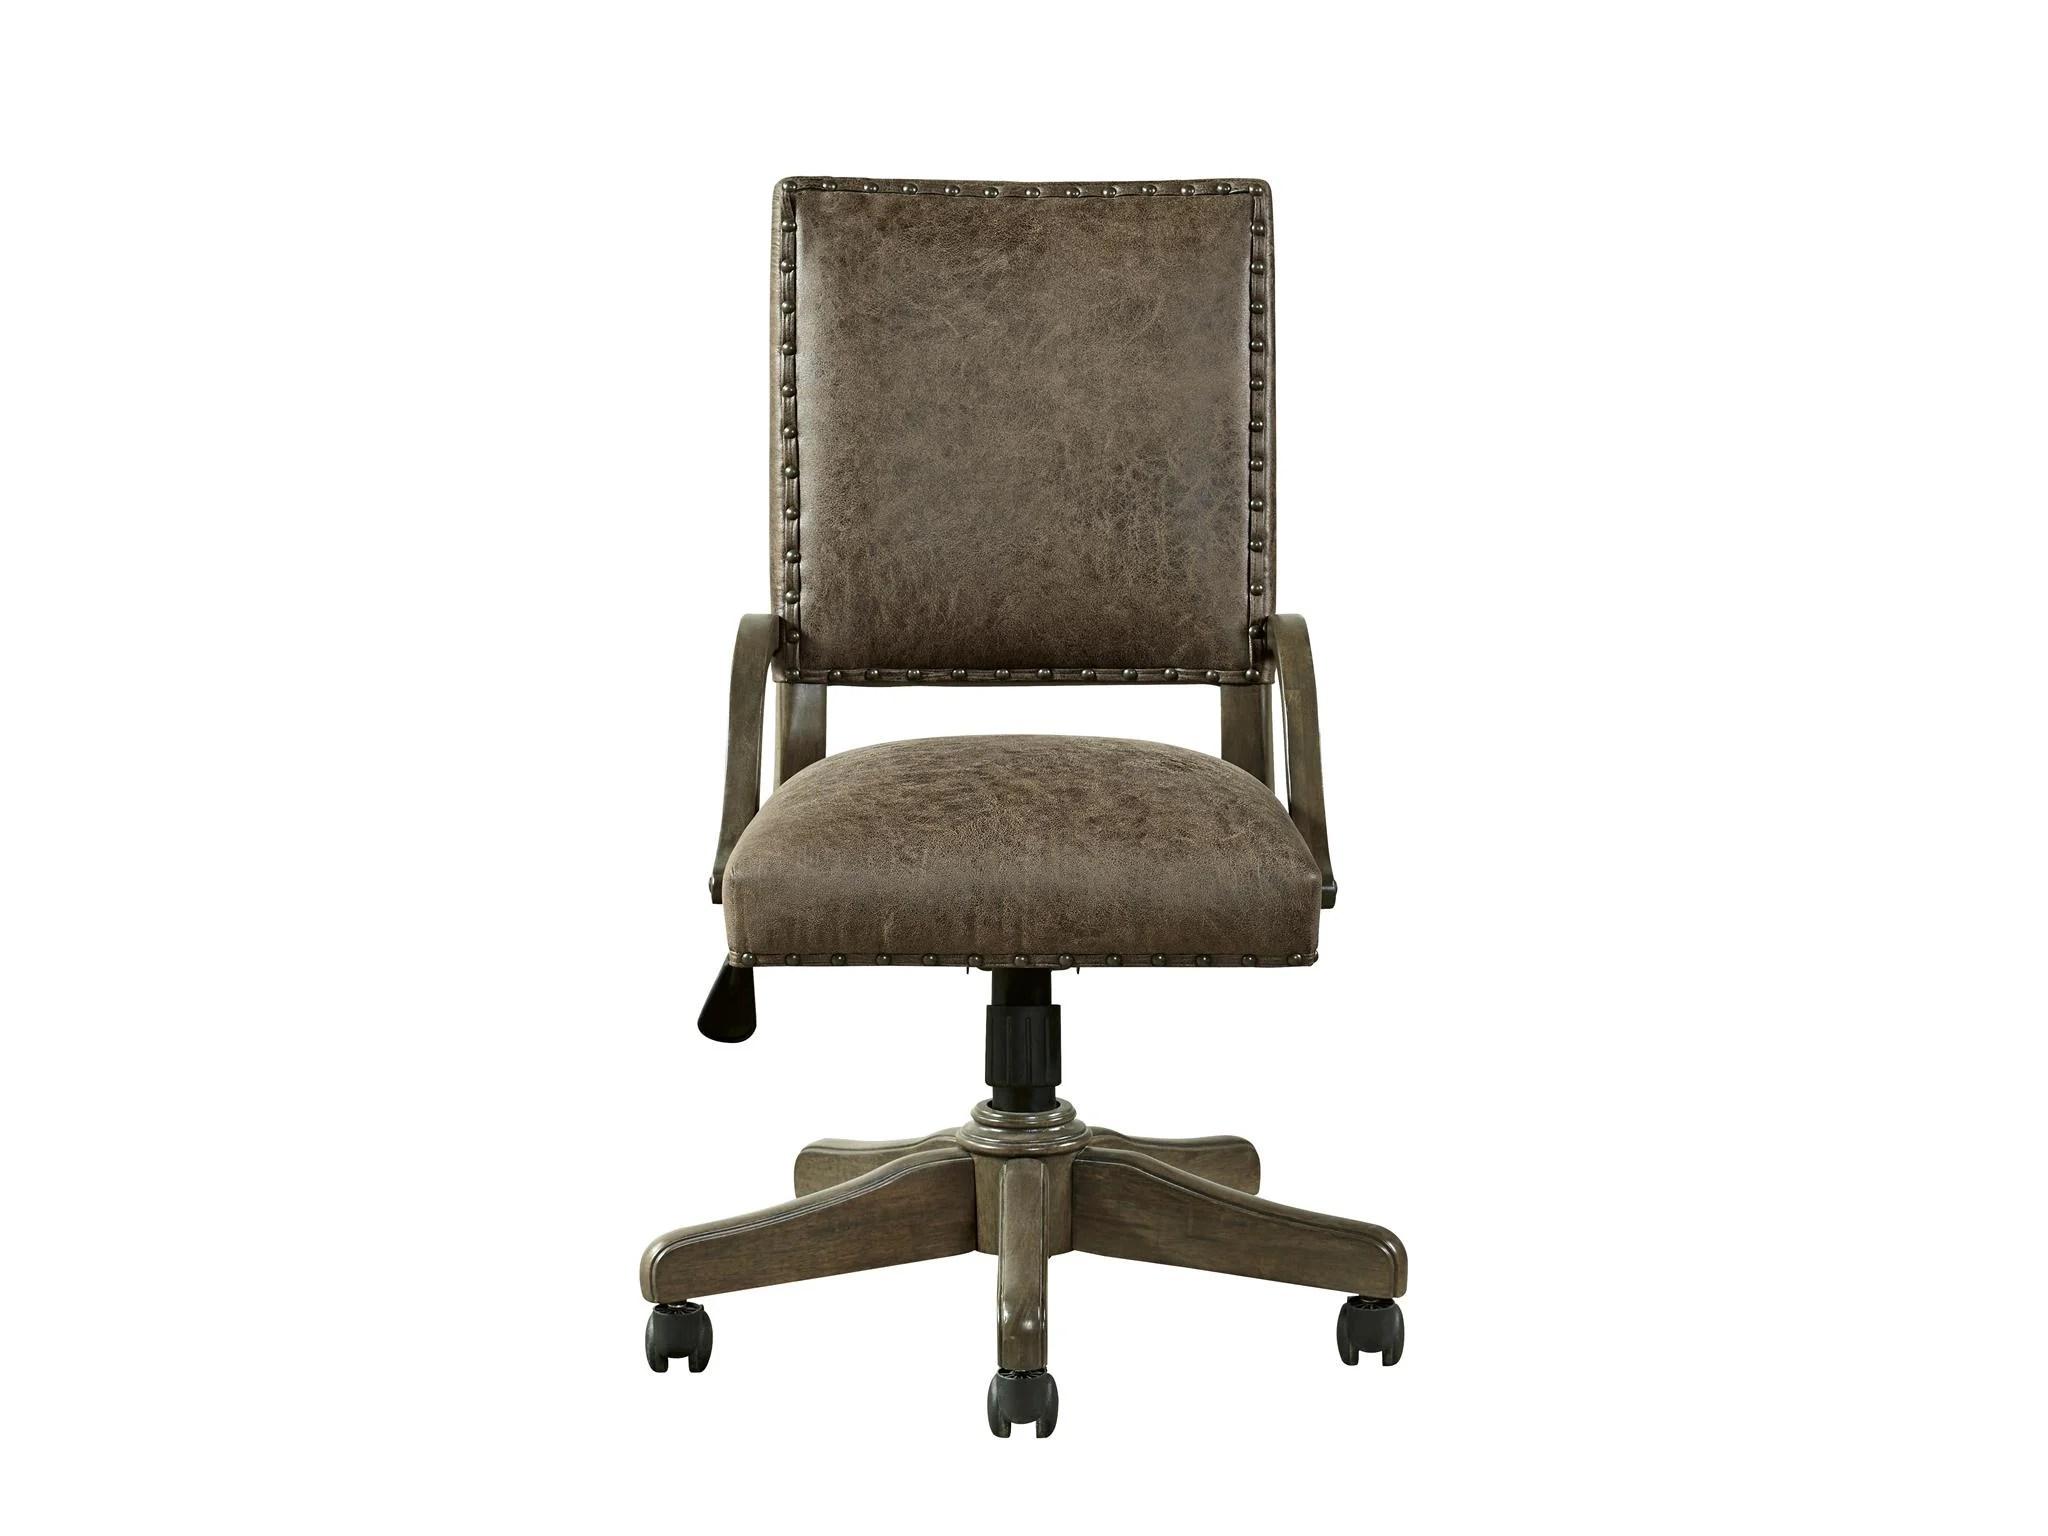 desk chair youtube home goods chairs smartstuff furniture varsity swivel